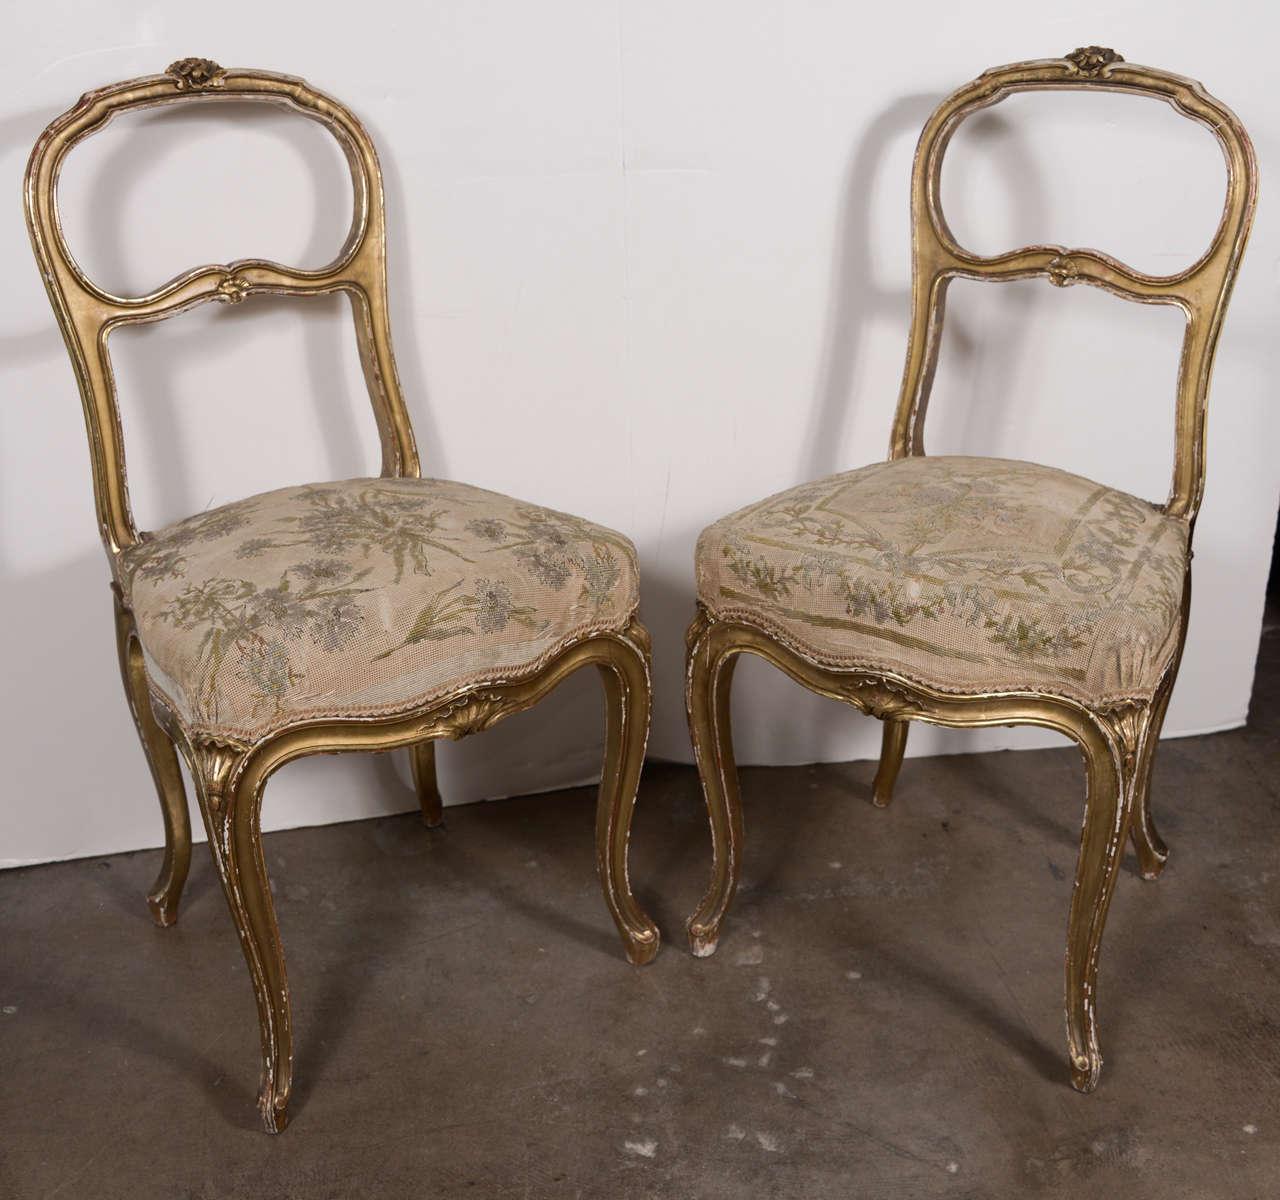 Pair of 18th century gilt ladies' chairs.